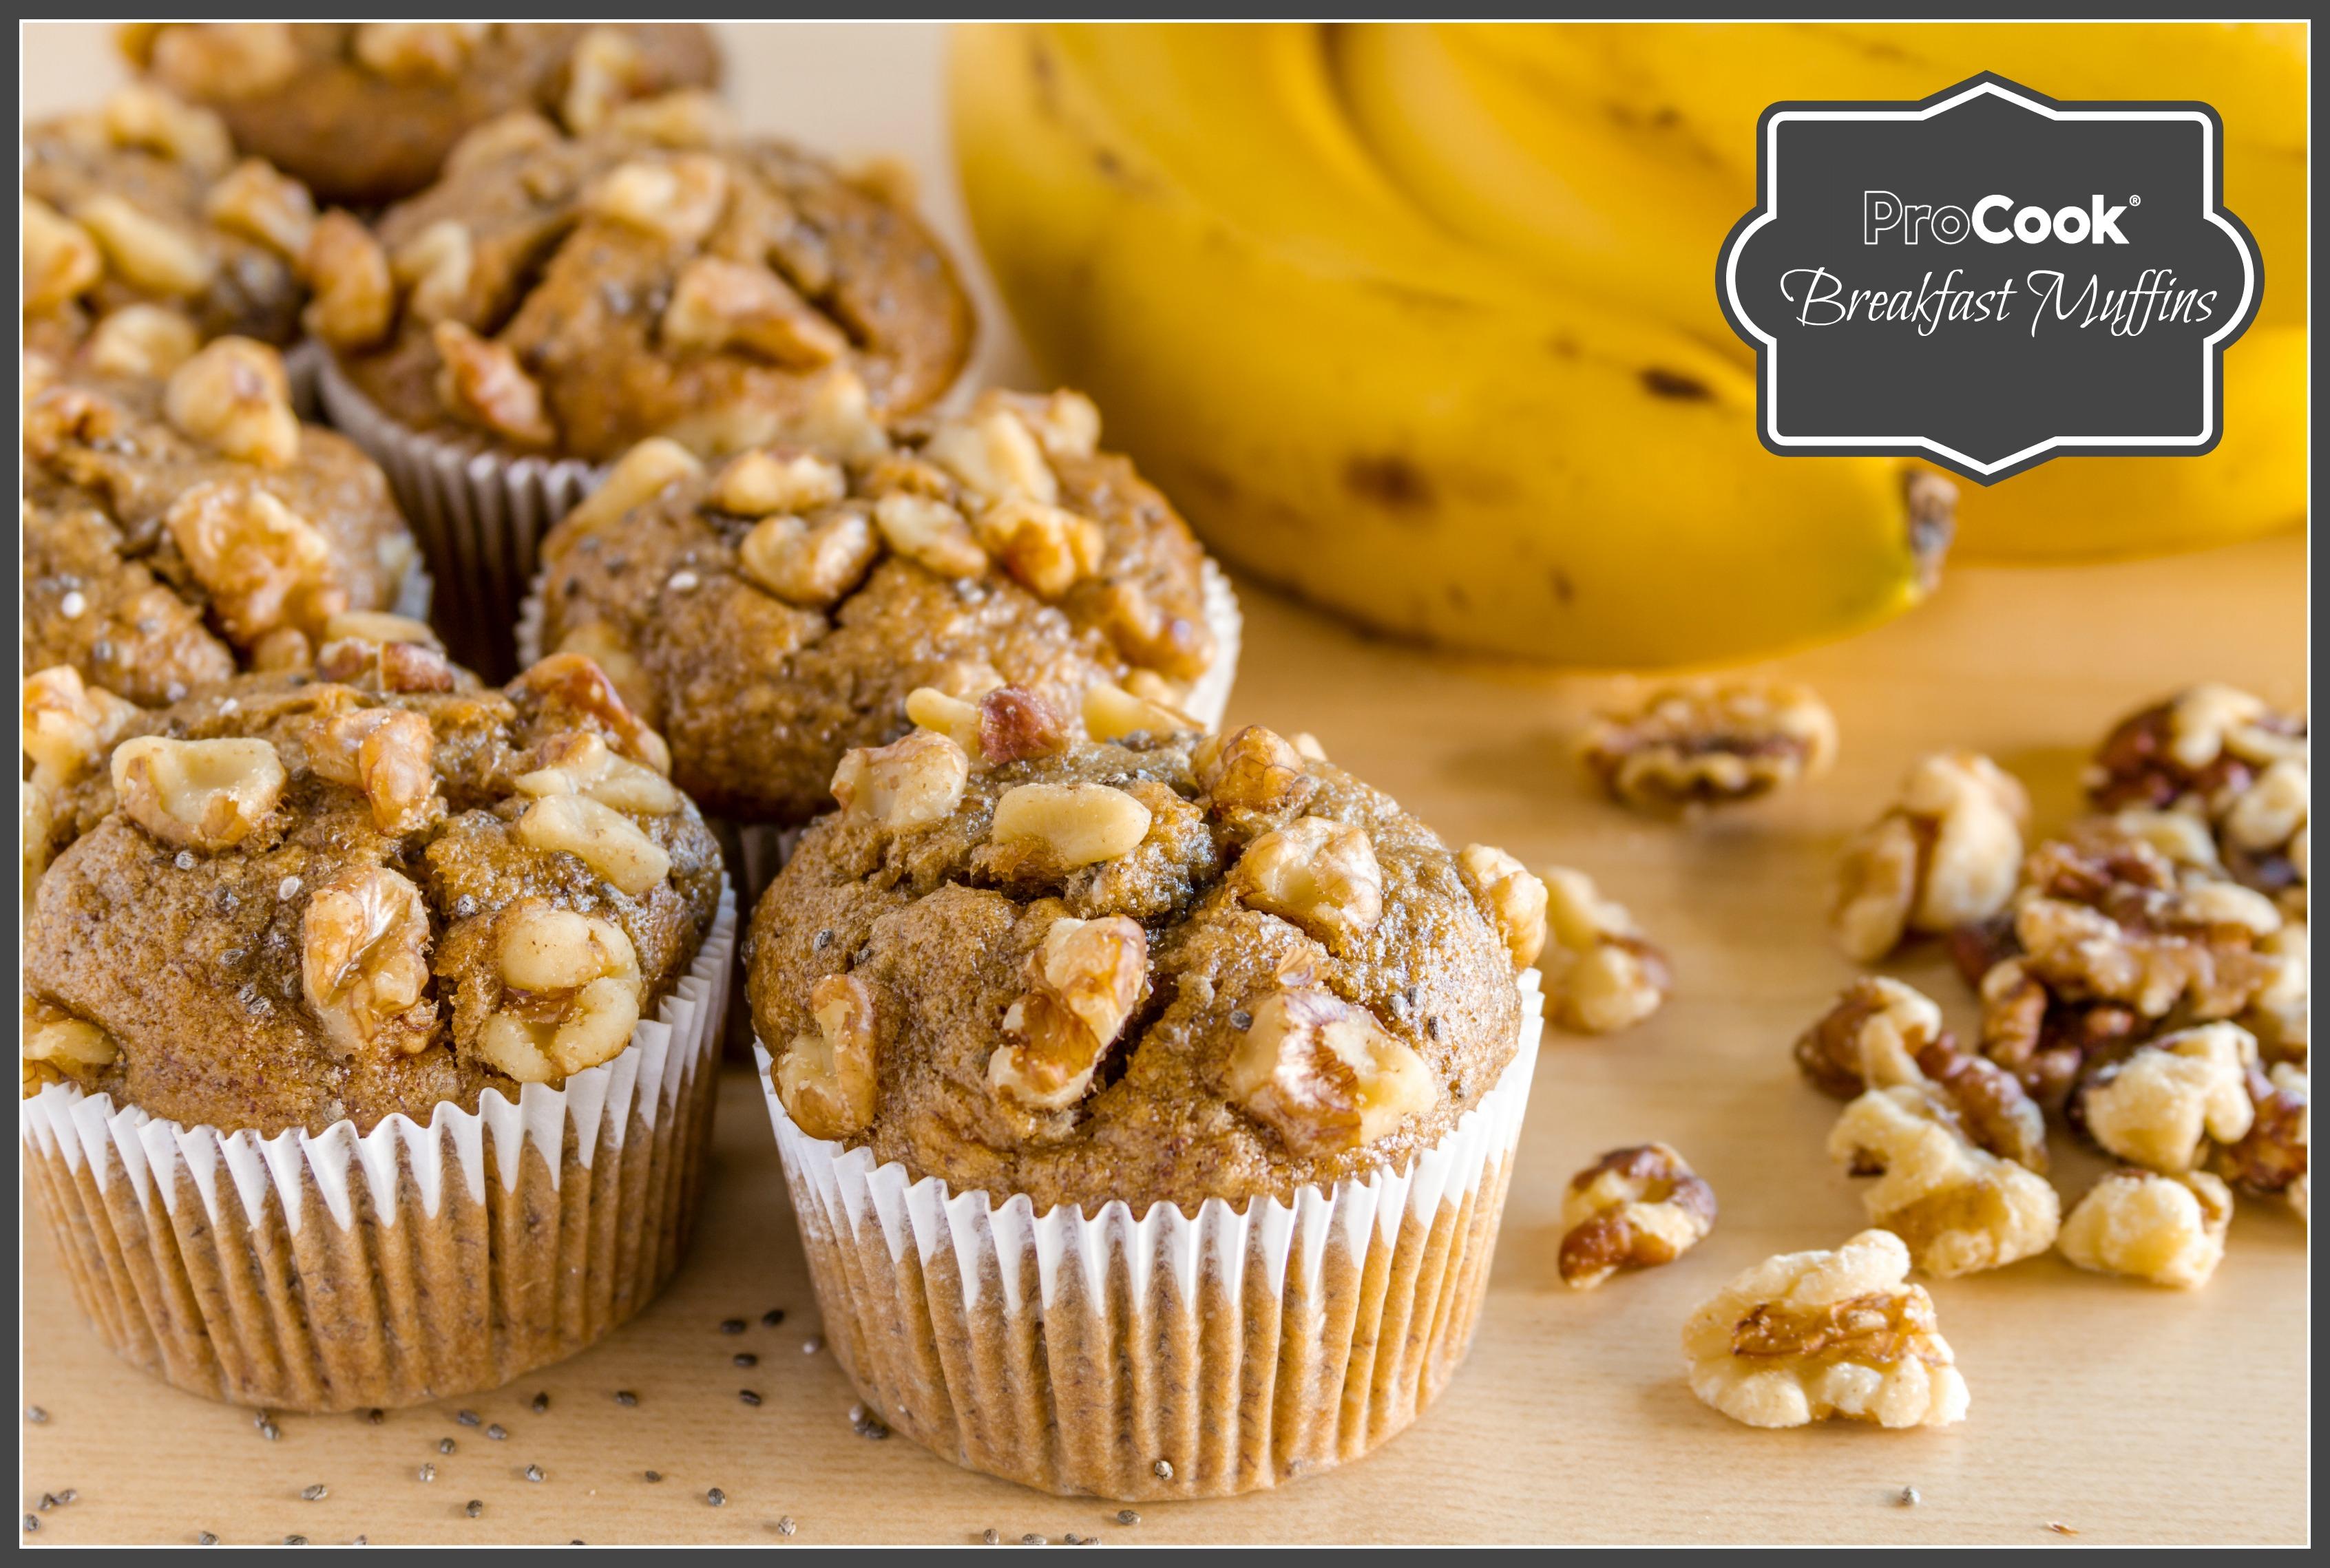 Banana & Walnut Breakfast Muffins